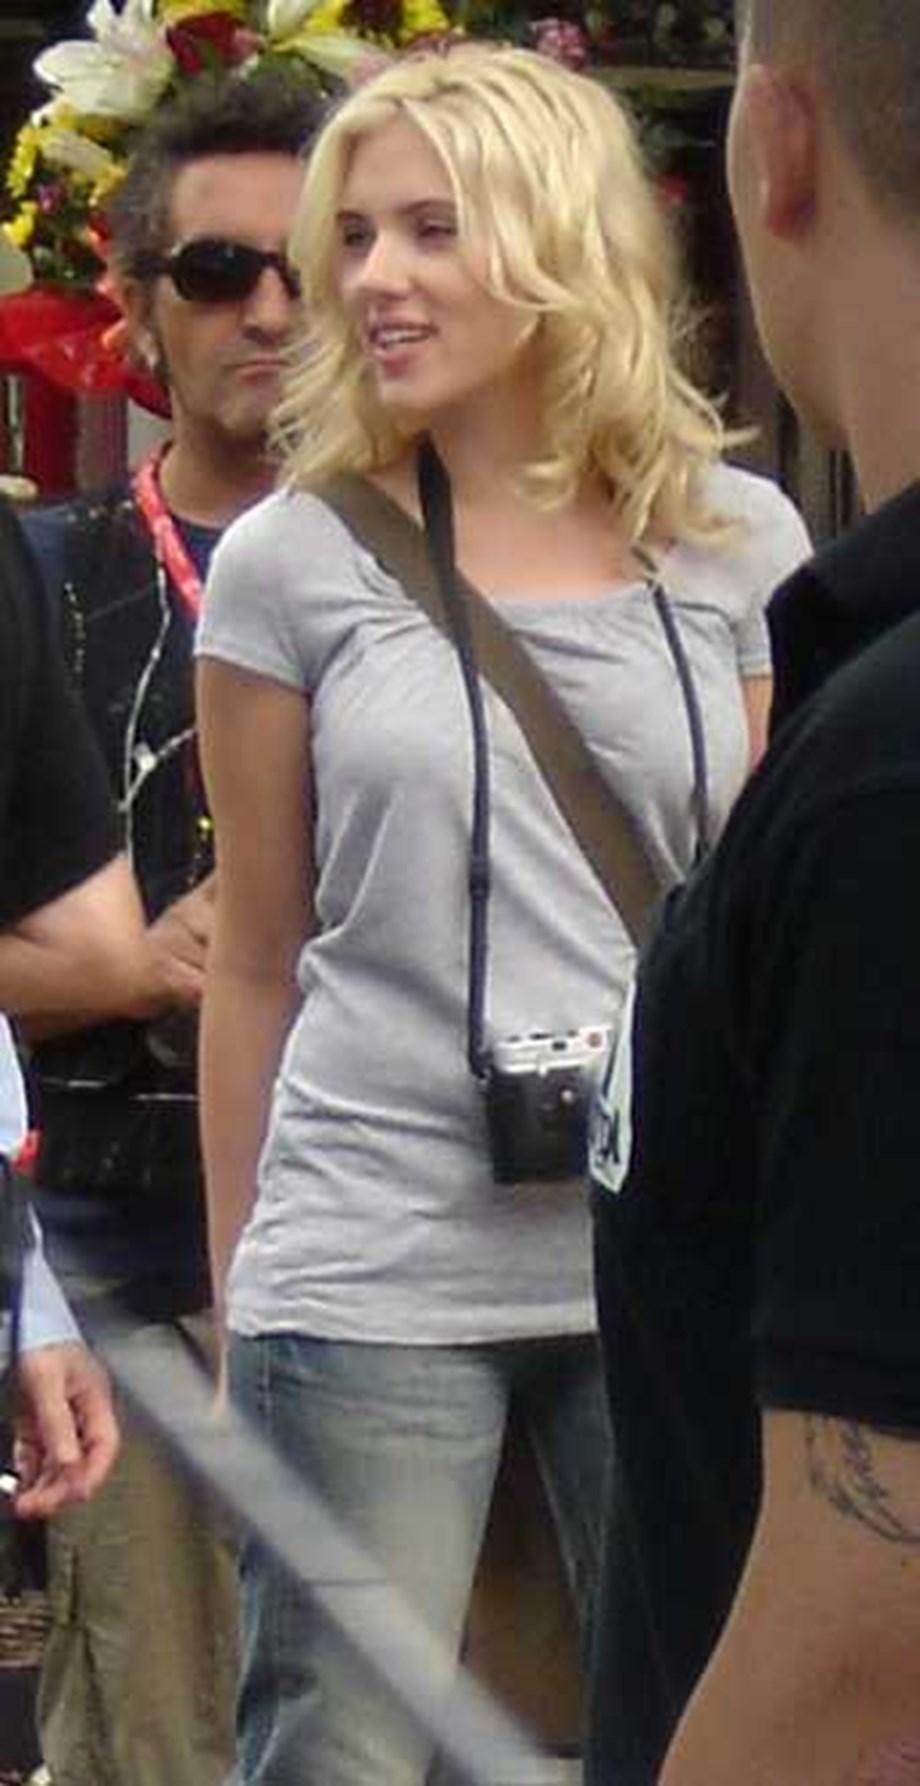 Scarlett Johansson runs into police station to get rid of crazy paparazzi